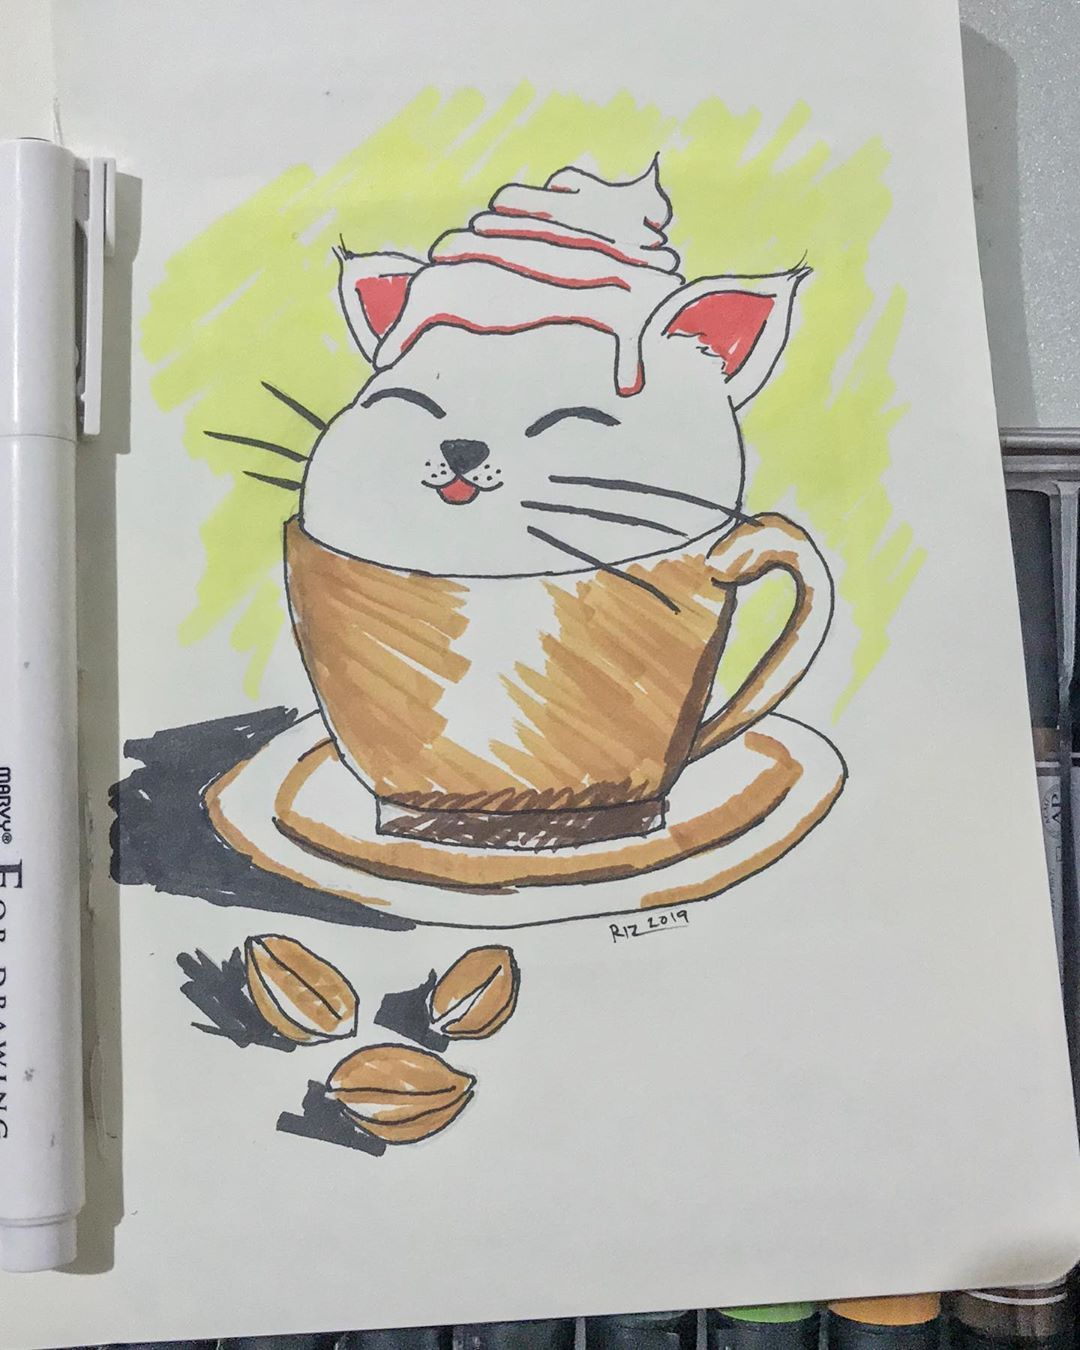 It's a Catfurccino... ha. ha. ha. Day 2 of Inktober 2019 Coffee Cat #catober  #catober2019  #inktober  #inktober2019  #ink #sketch #art #inktober2019